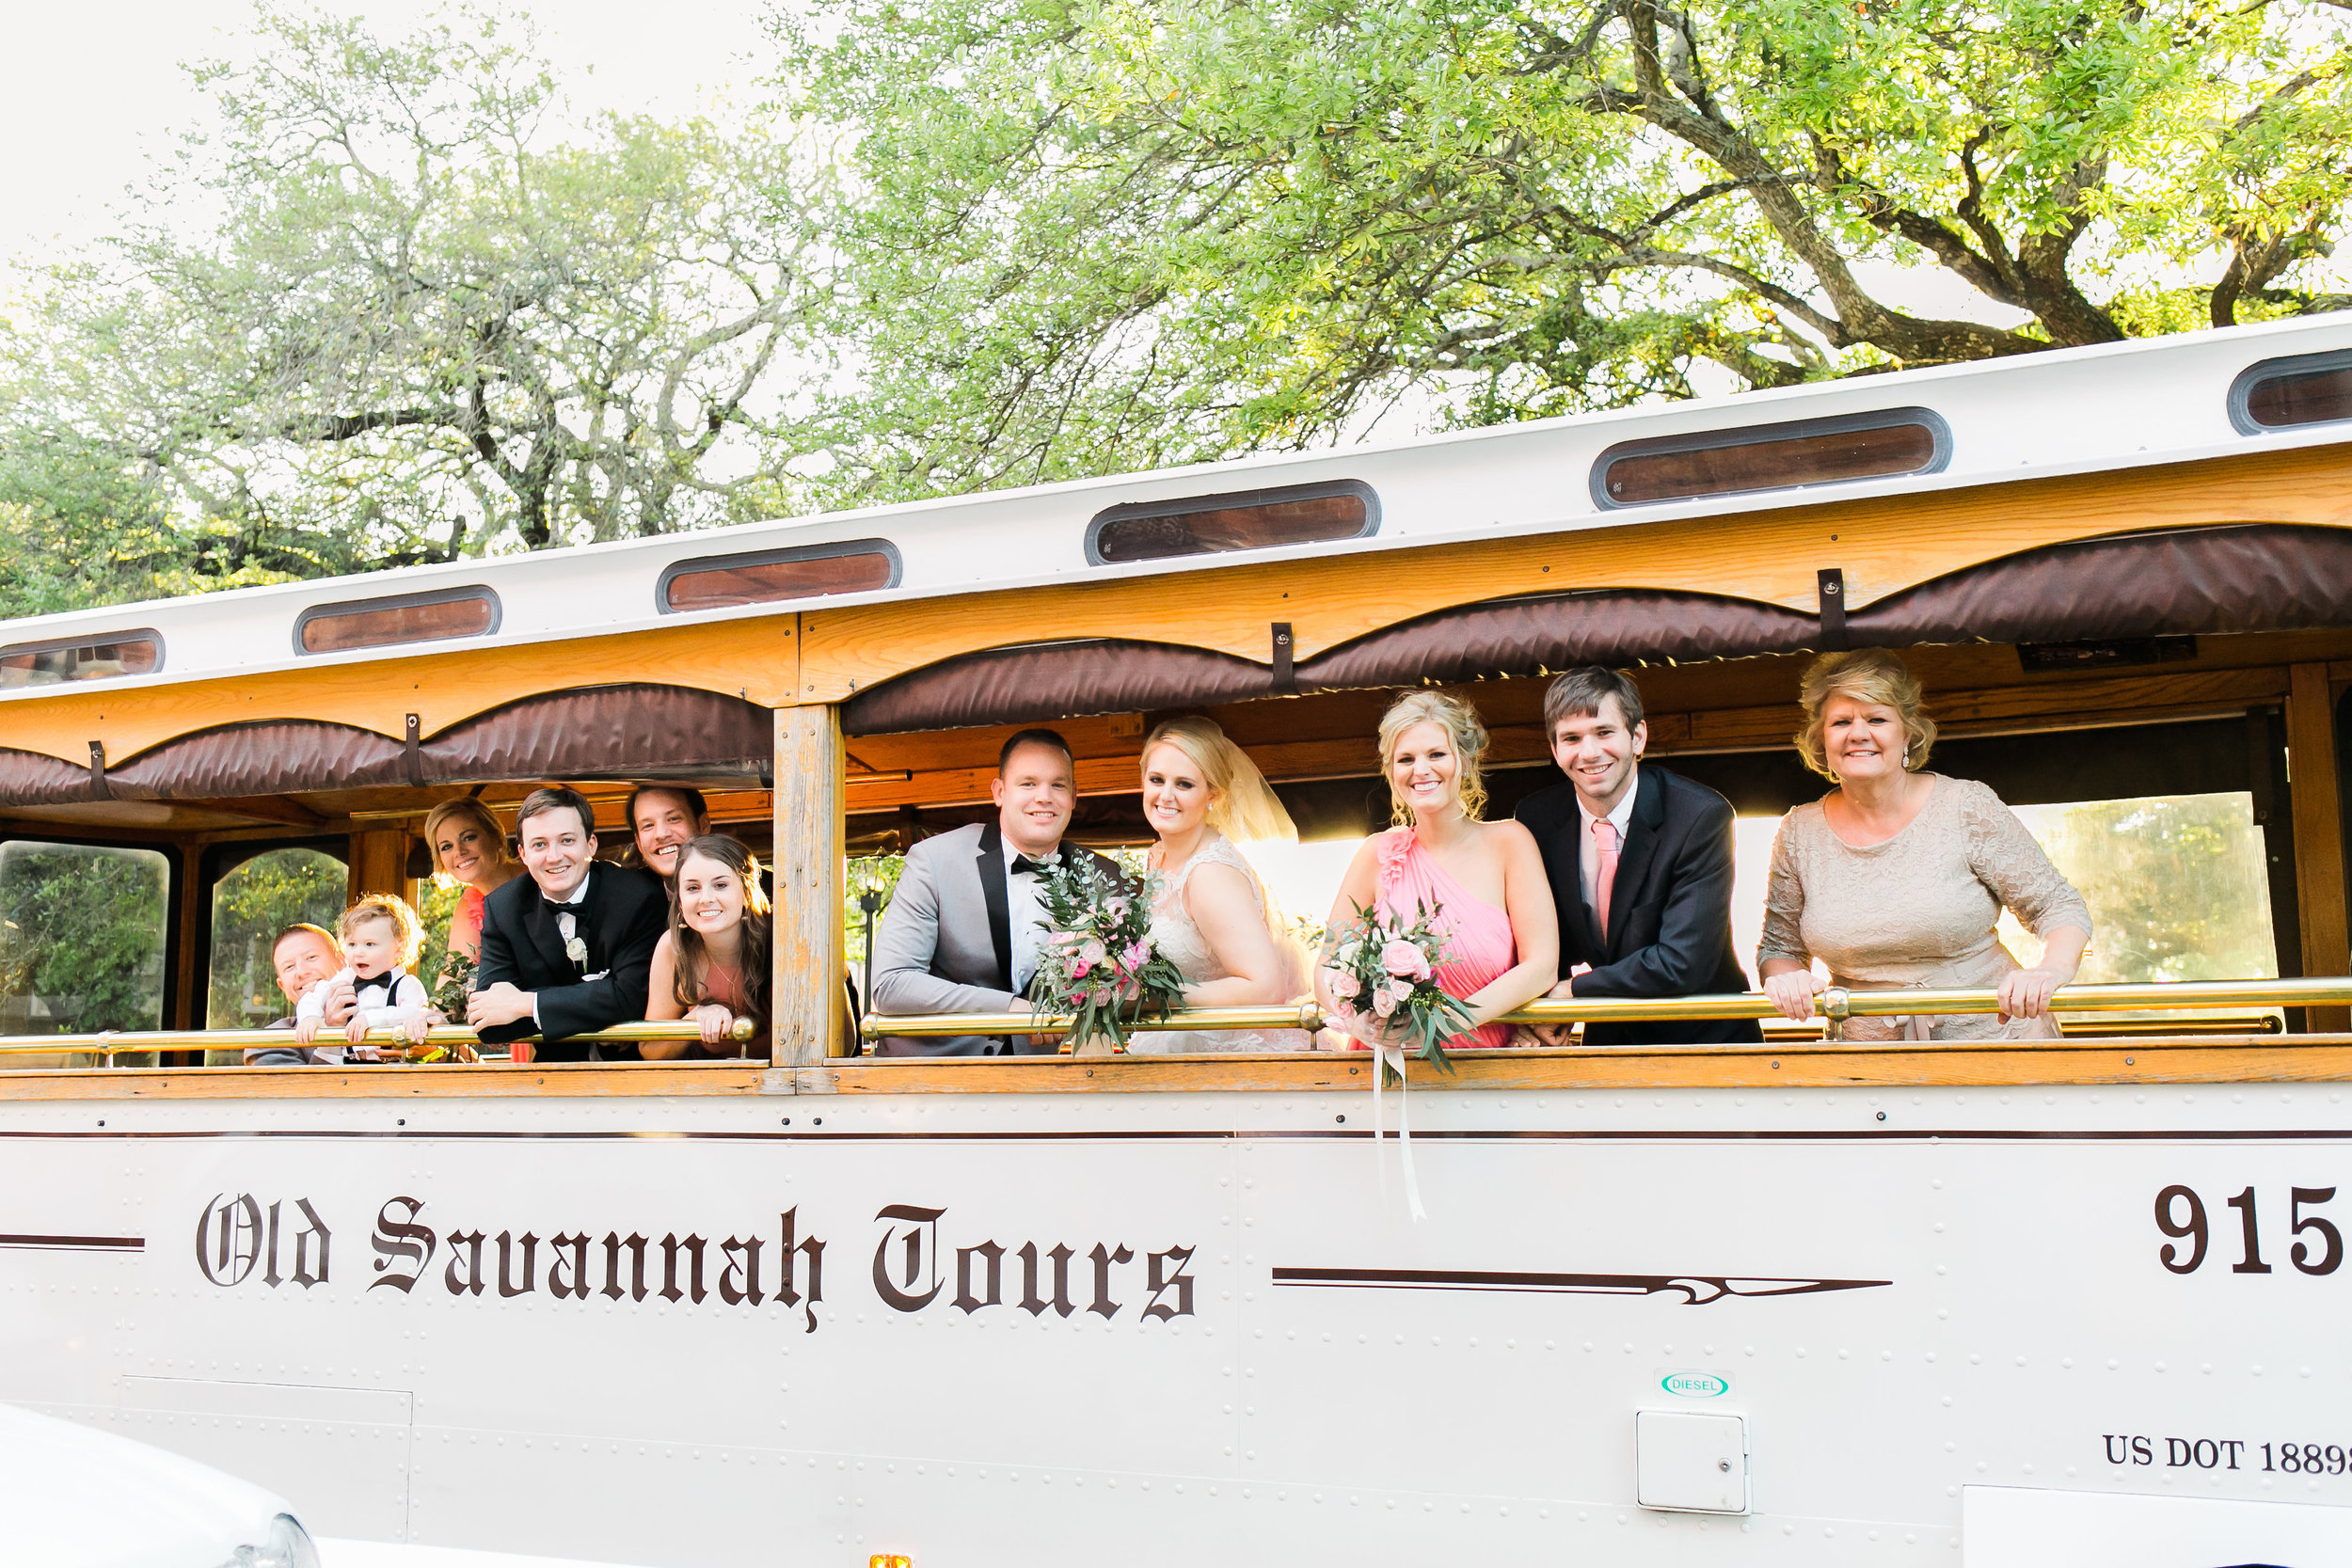 Savannah GA wedding transportation and trolleys - Old Savannah Tours